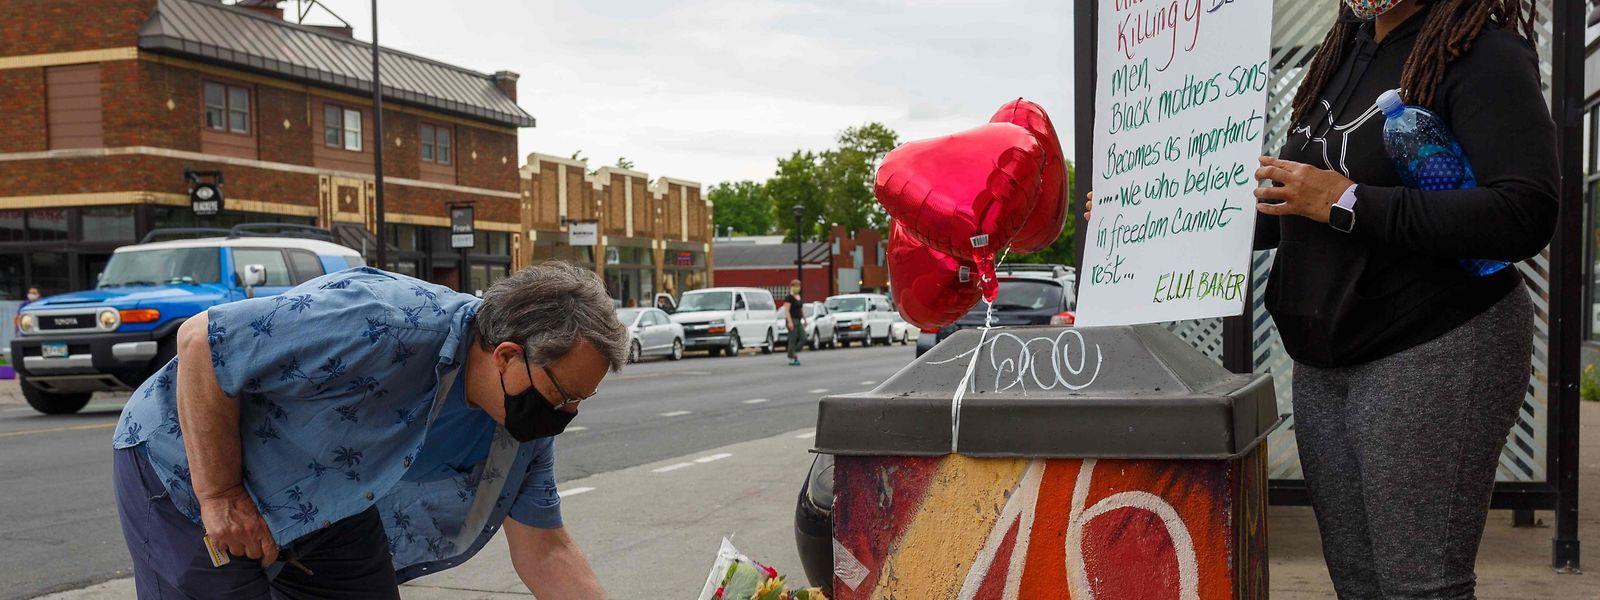 Demonstranten legen Blumen an der Stelle nieder, wo